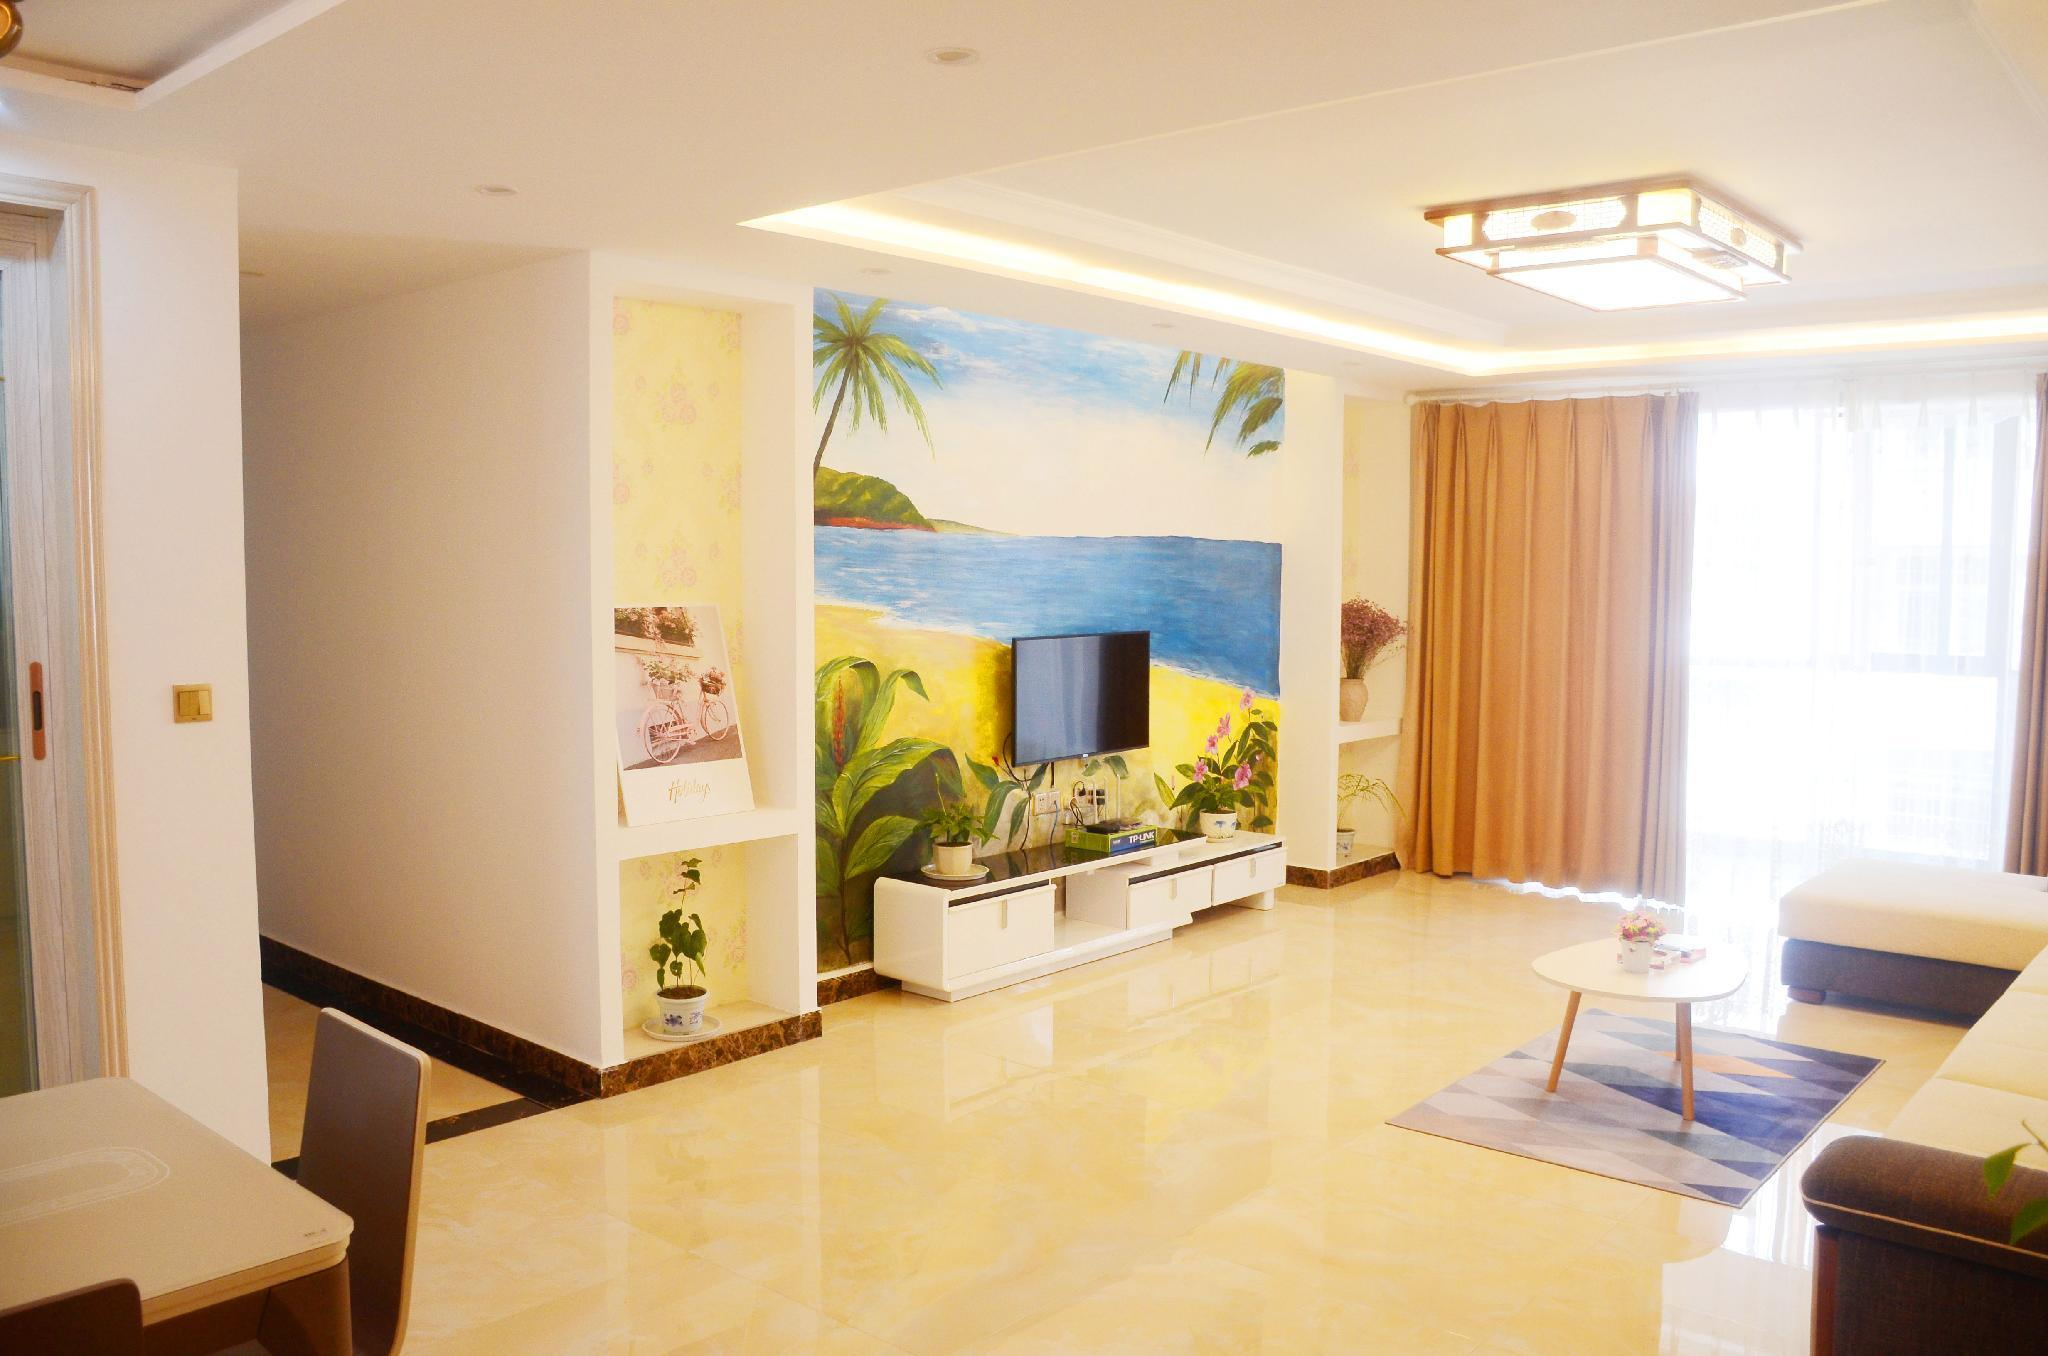 Valley.manju Apartment – Picture, Prices & Deals